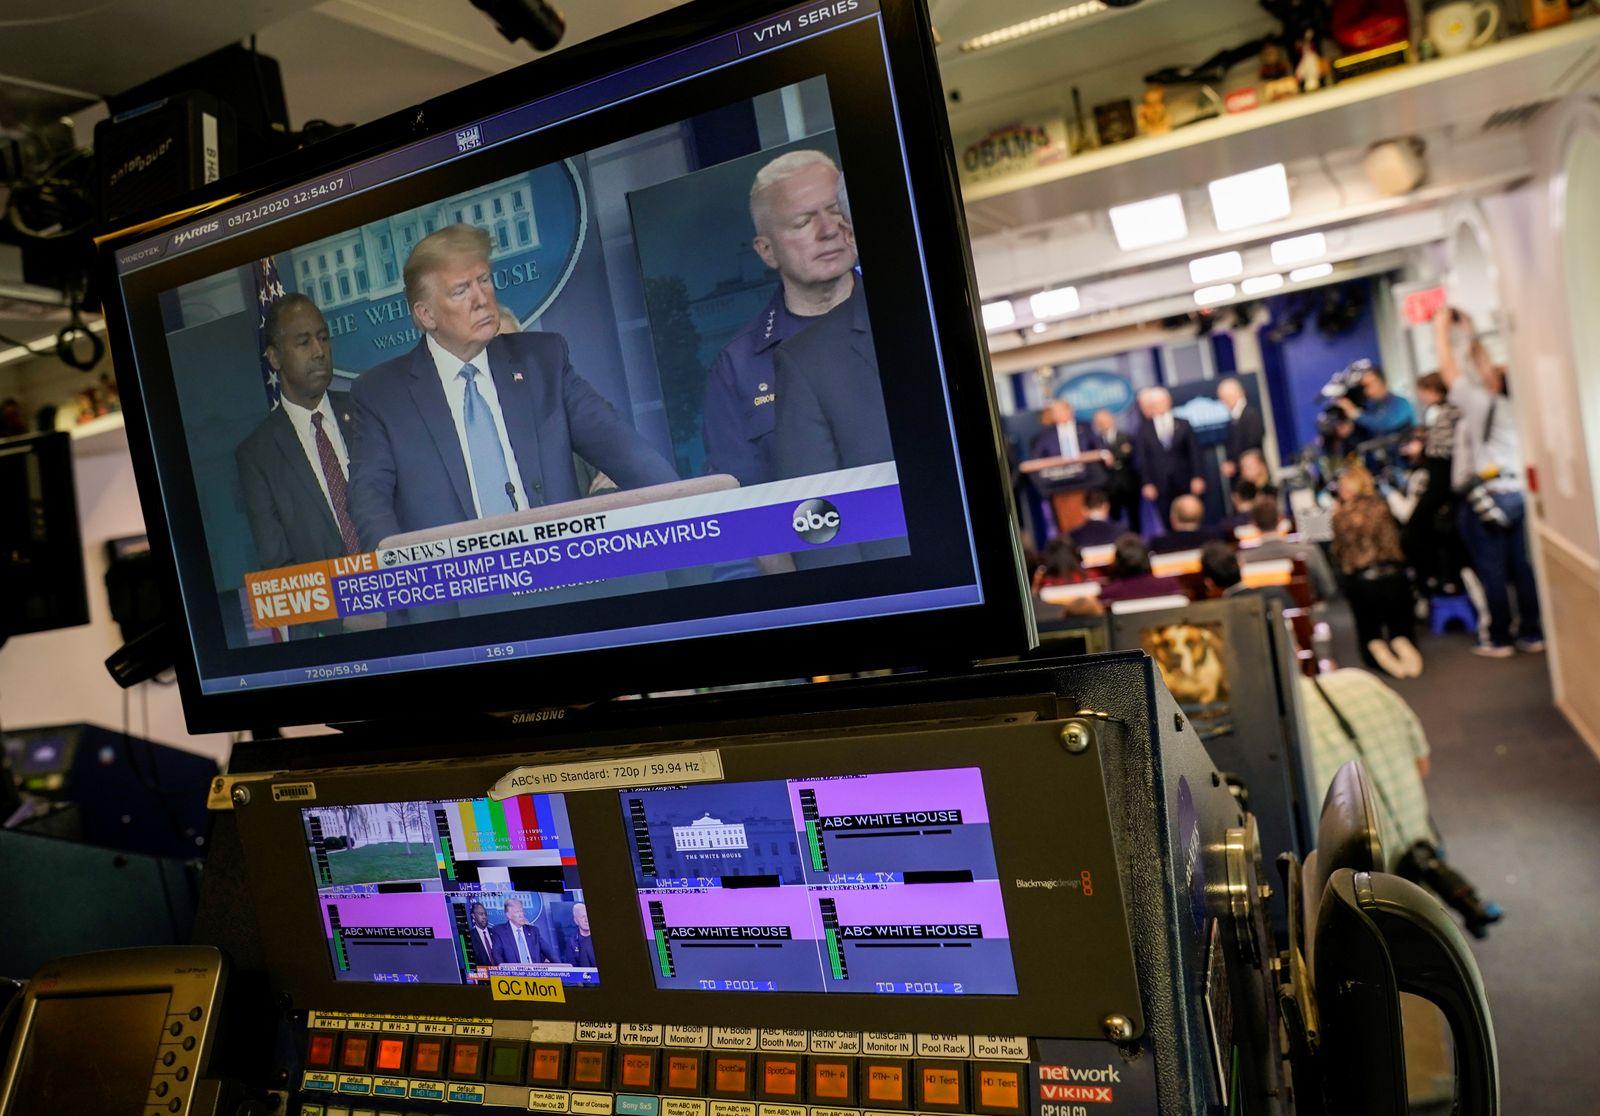 U.S. President Trump speaks during a news briefing on coronavirus in Washington.